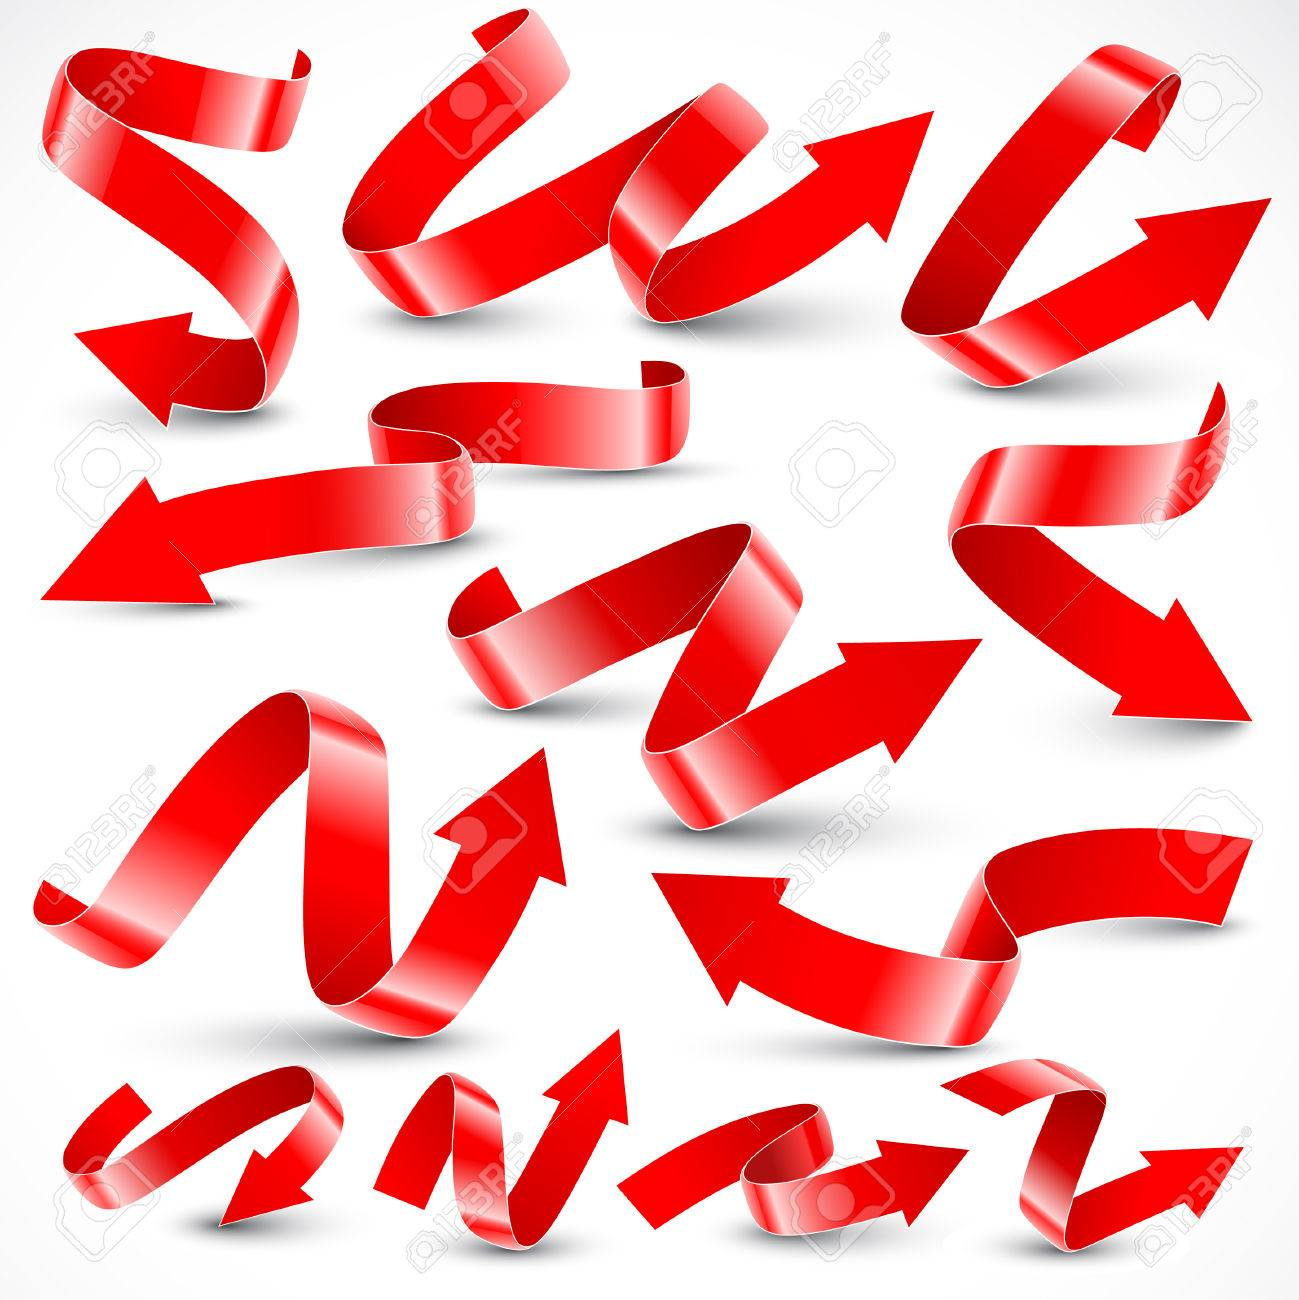 Red arrows. Vector illustration. Stock Vector - 8391548